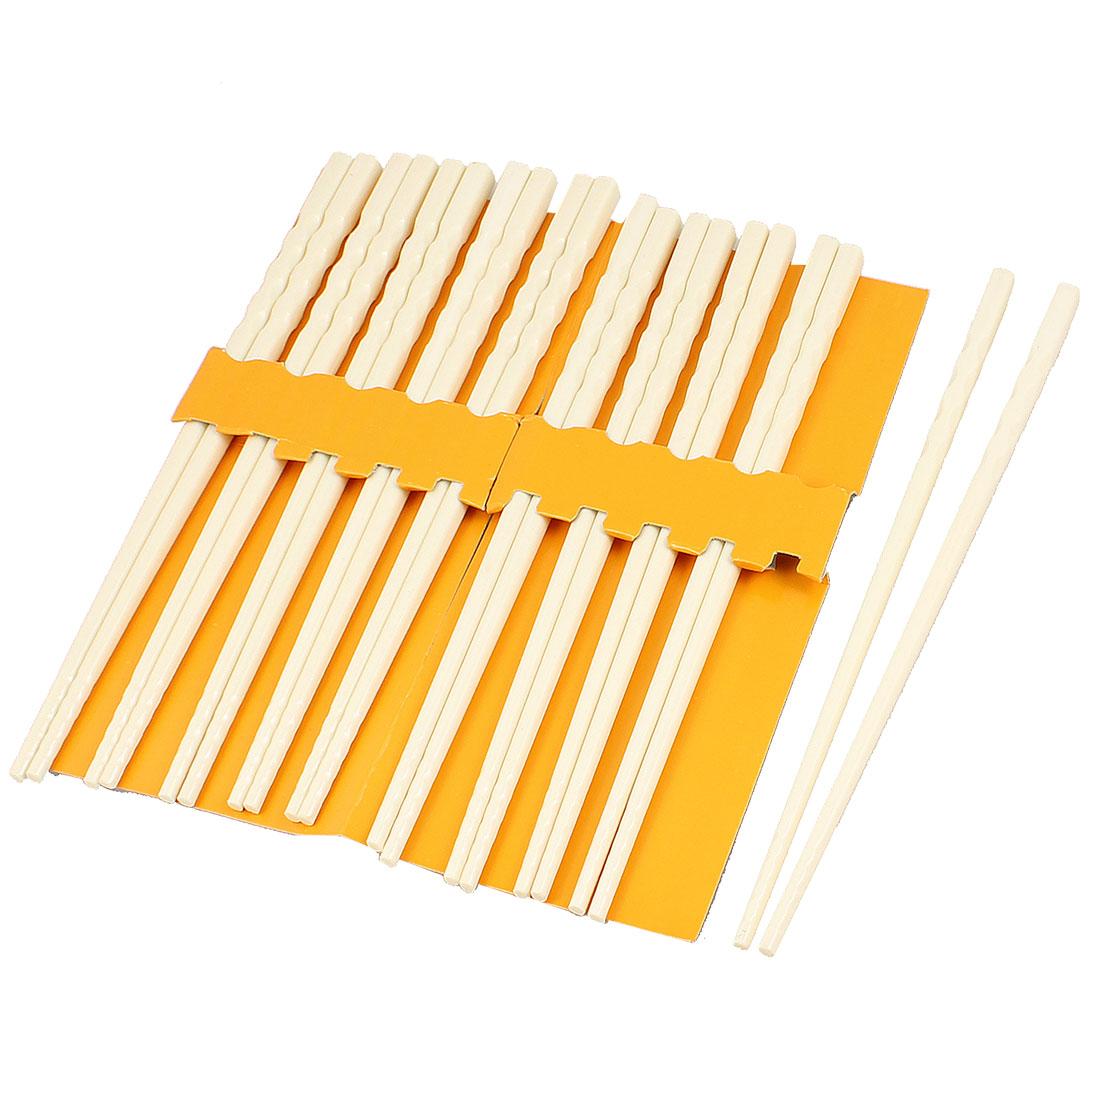 10 Pairs Kitchen Dishware Nonslip Plastic Chopsticks Beige